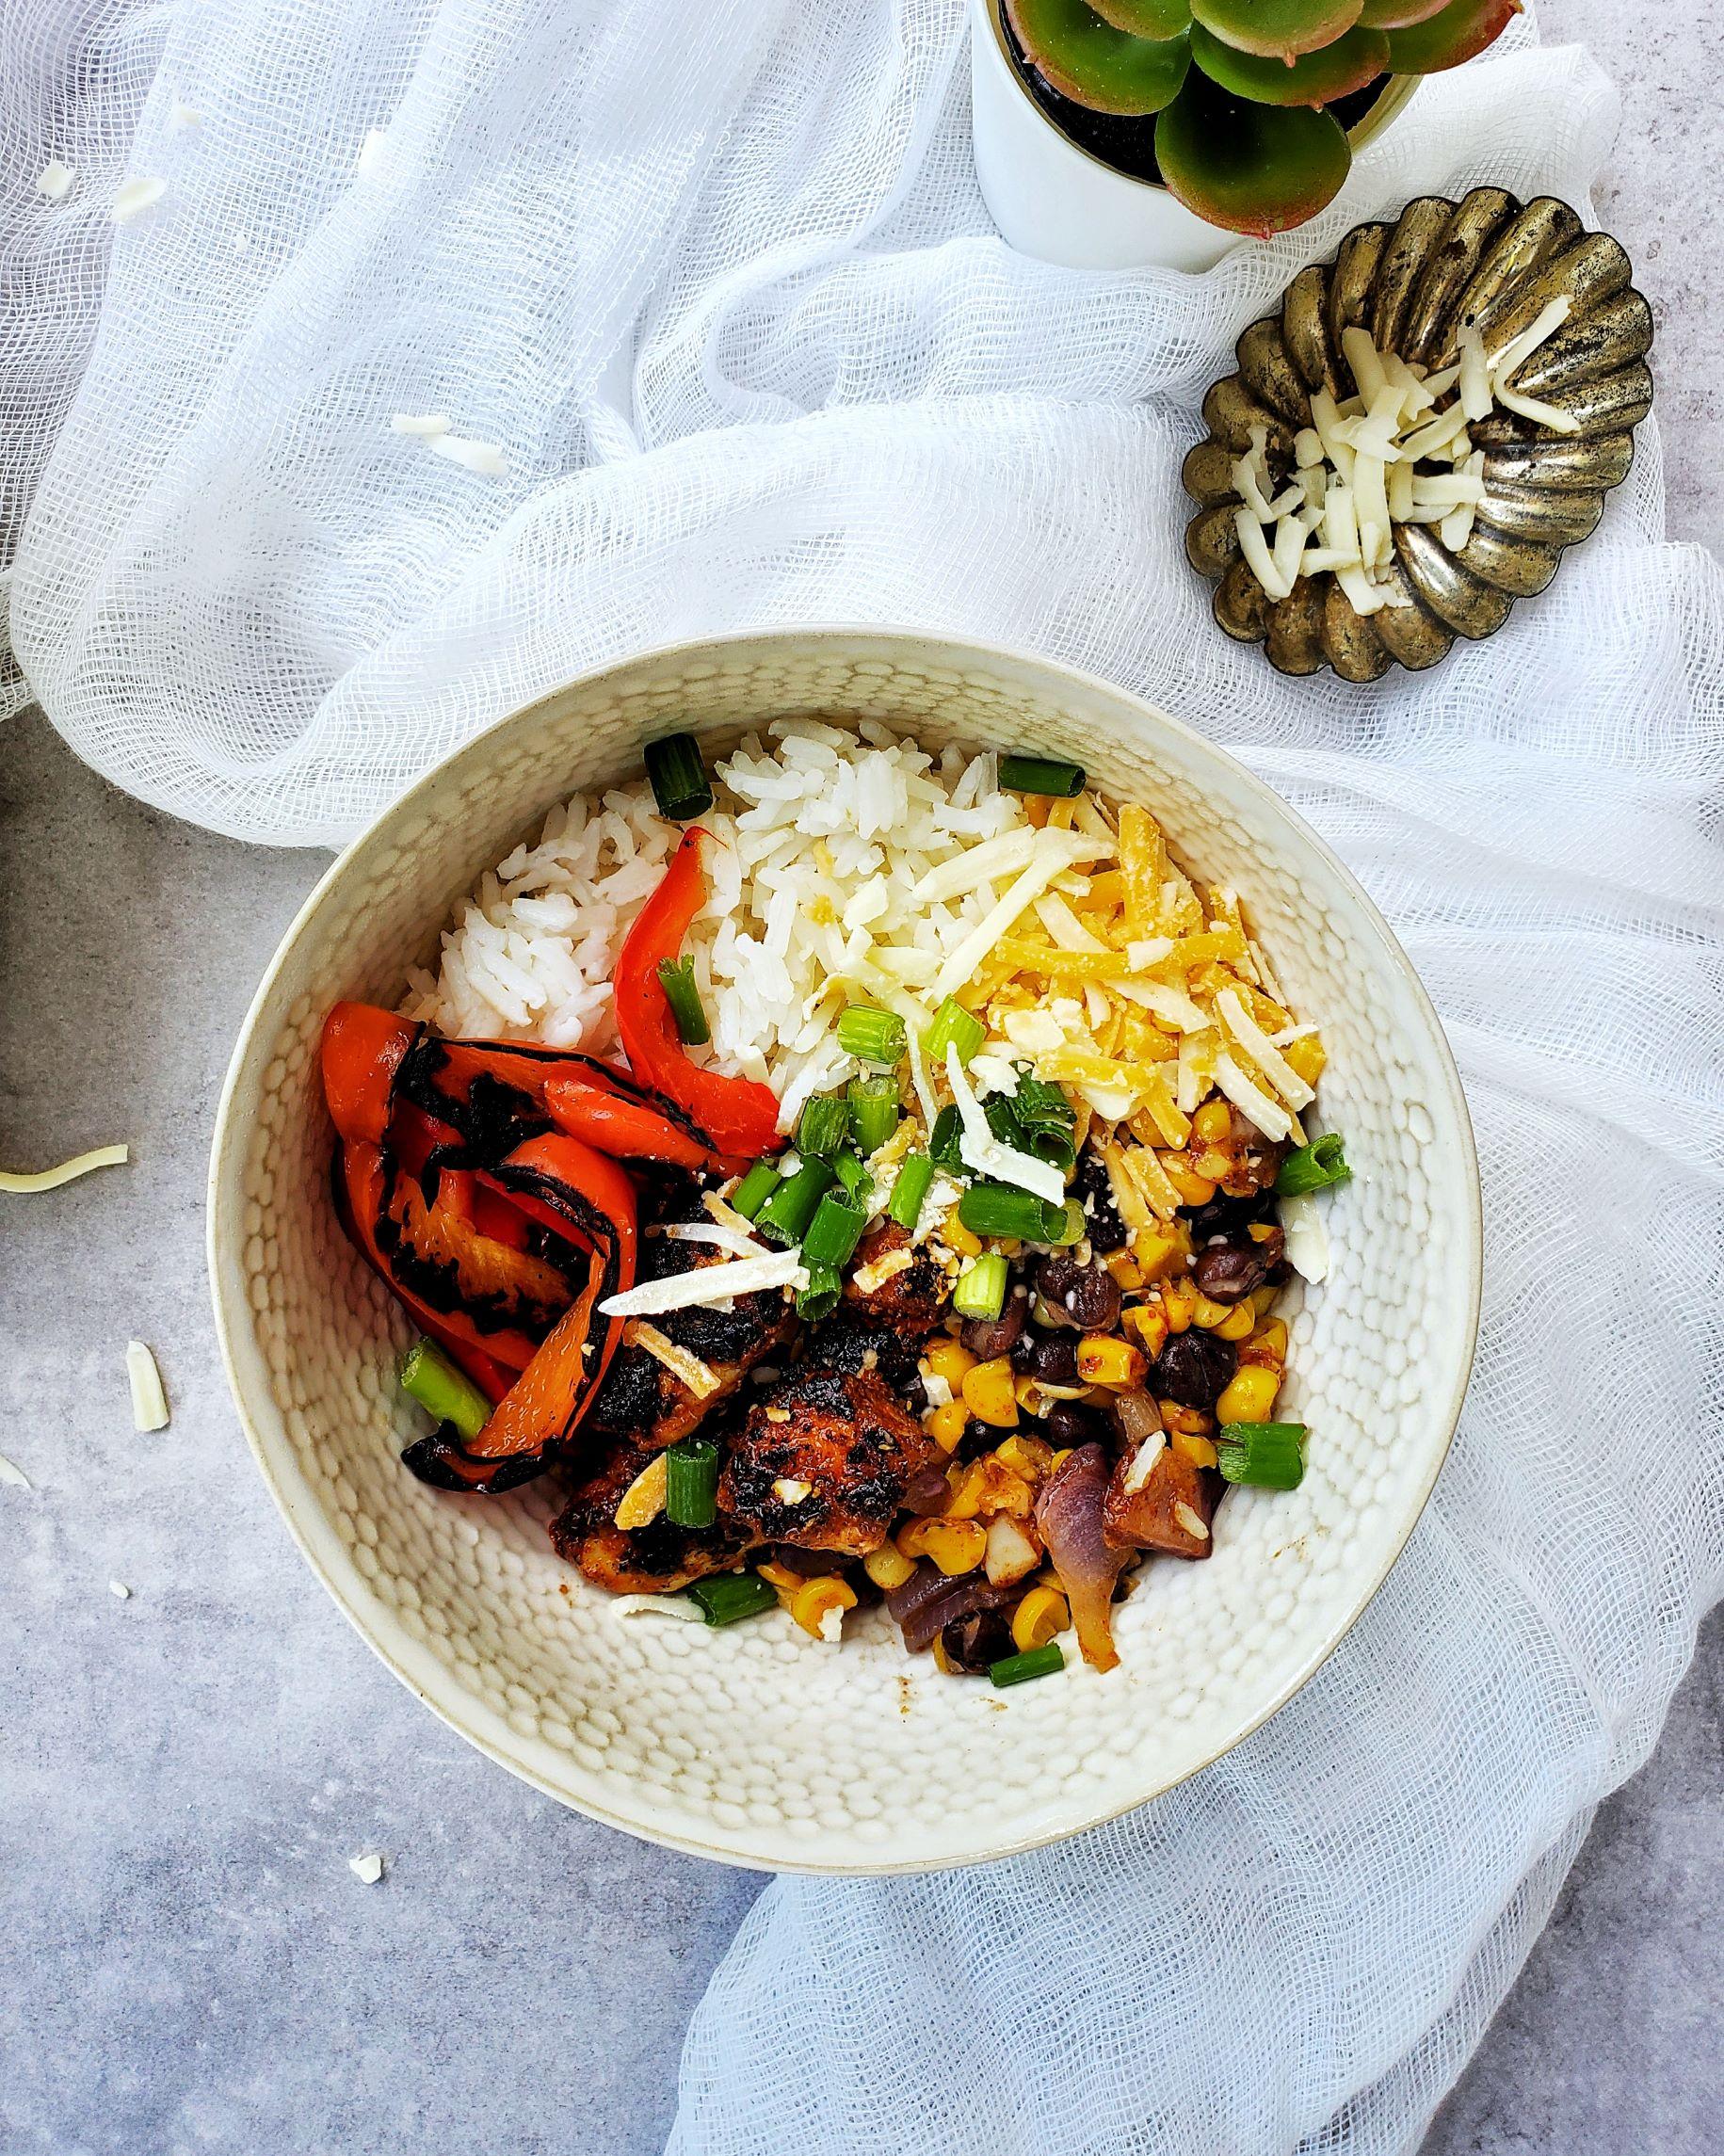 Chicken Fajita Bowl on Table